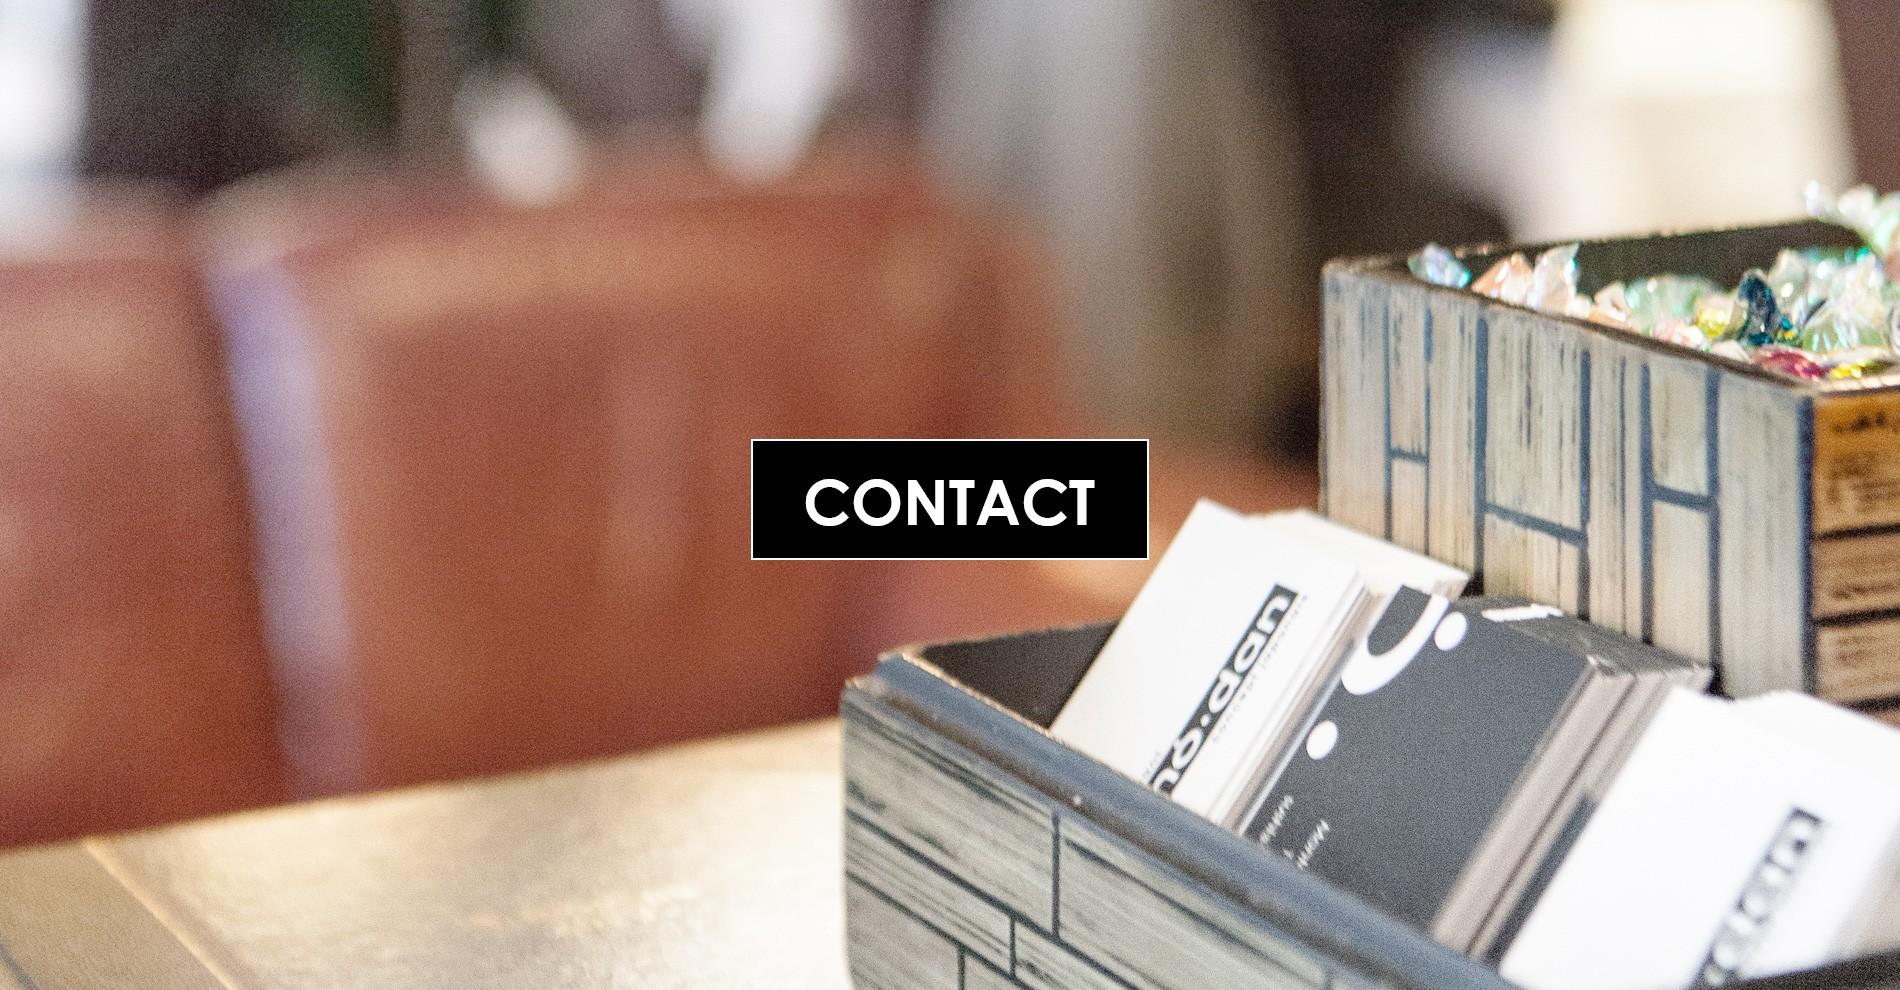 Contact Contact Fr